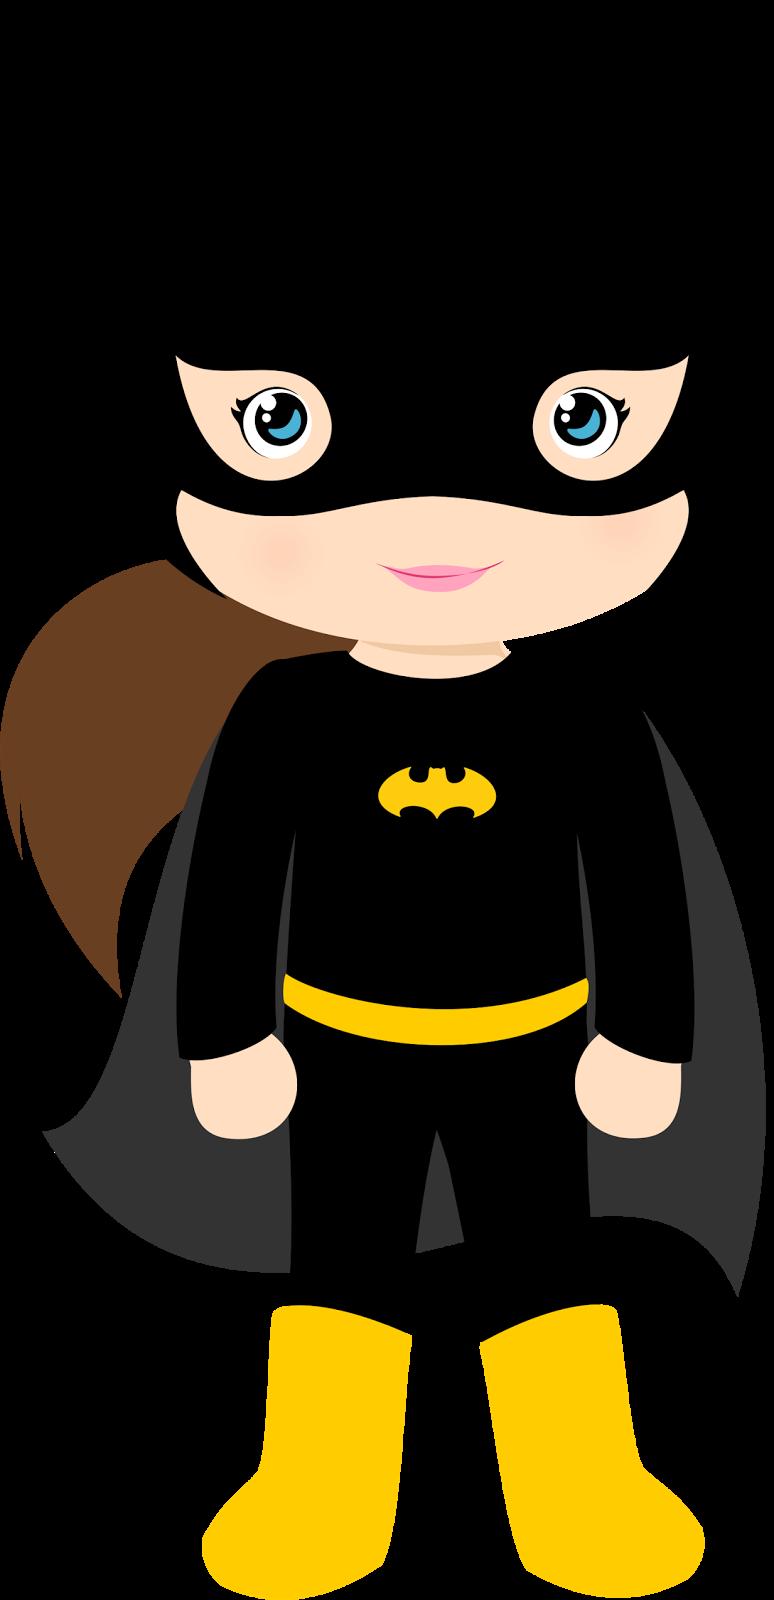 Characters clipart hero. Of batman kids version